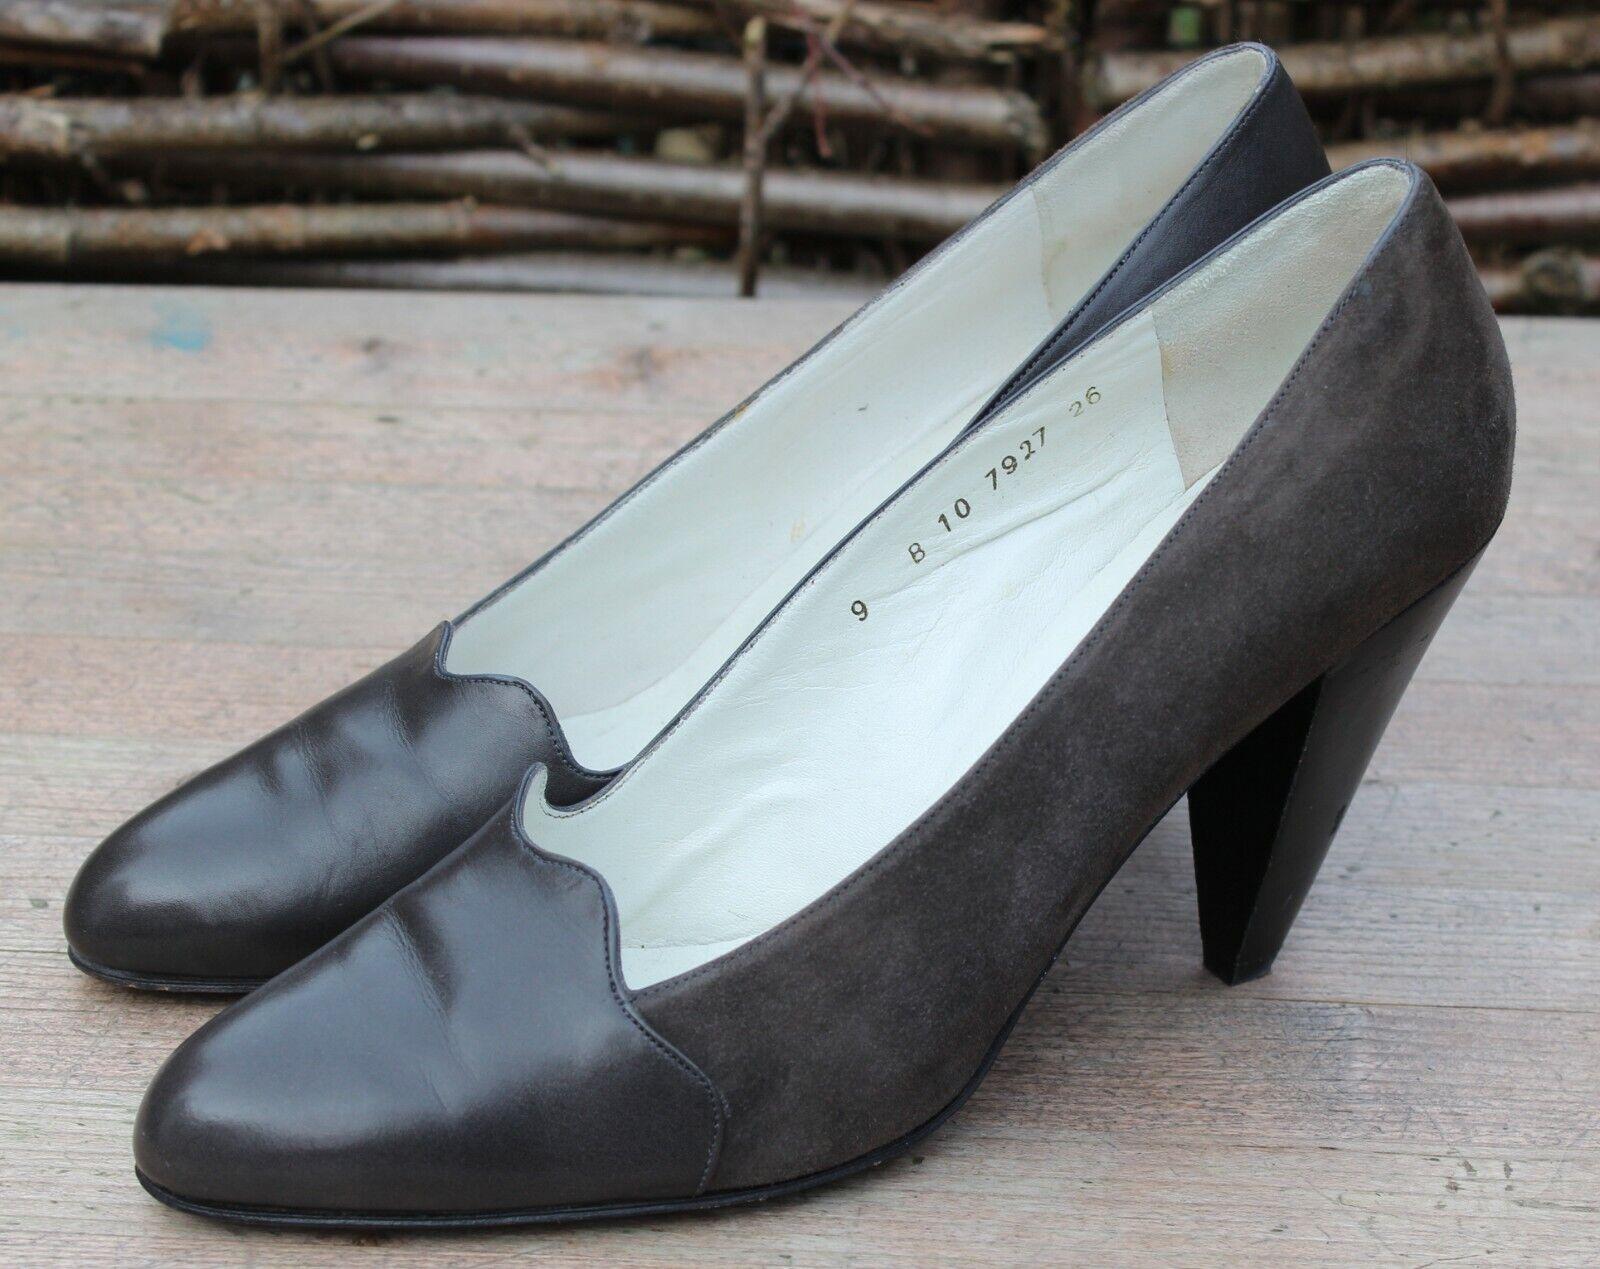 Nuova lista Robert Clergerie PARIS VINTAGE Taupe Suede Suede Suede & Leather Scarpe con tacco a CONO 9B  autentico